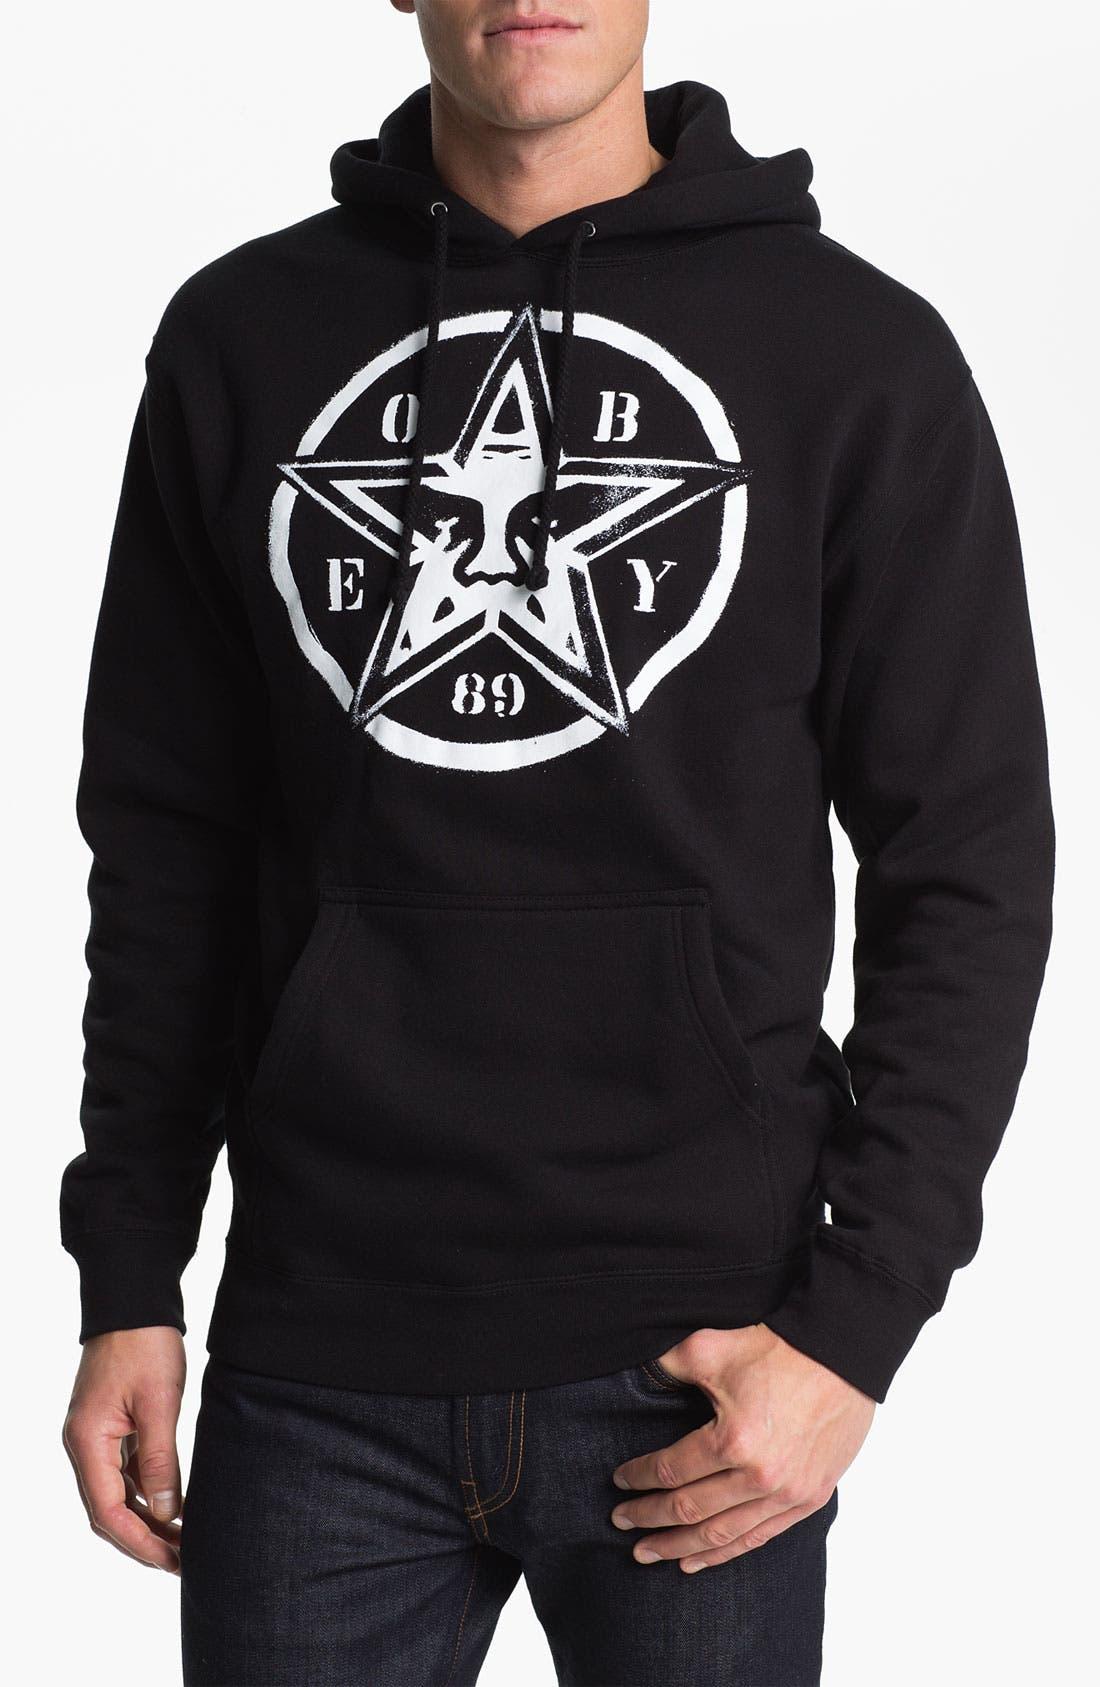 Main Image - Obey 'Star Stencil' Regular Fit Hooded Sweatshirt